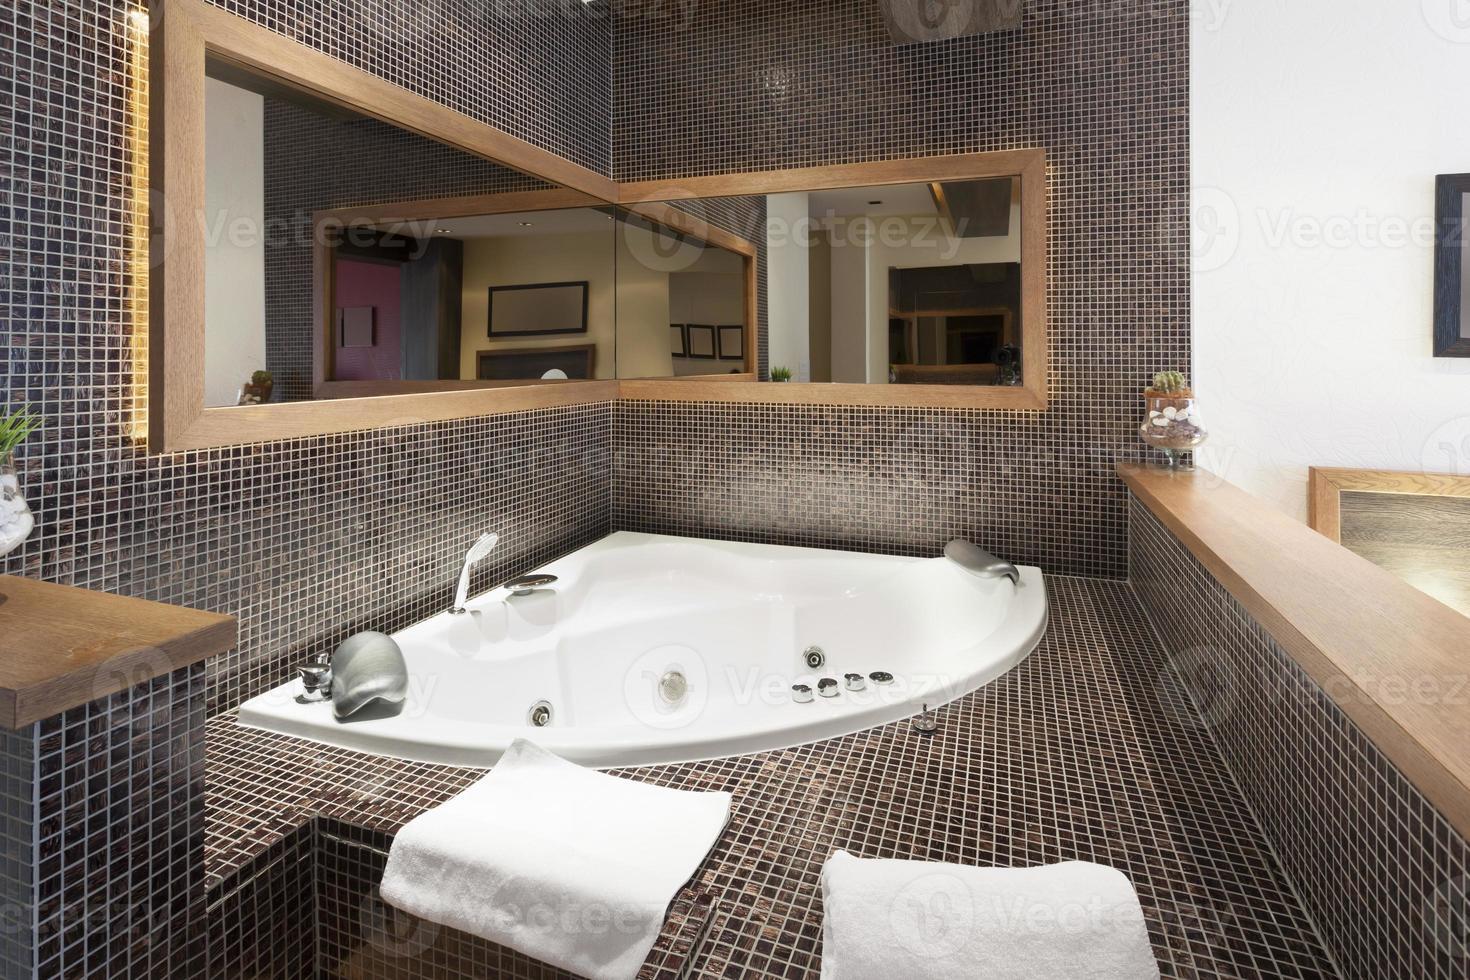 hot tub in hotel room interior photo